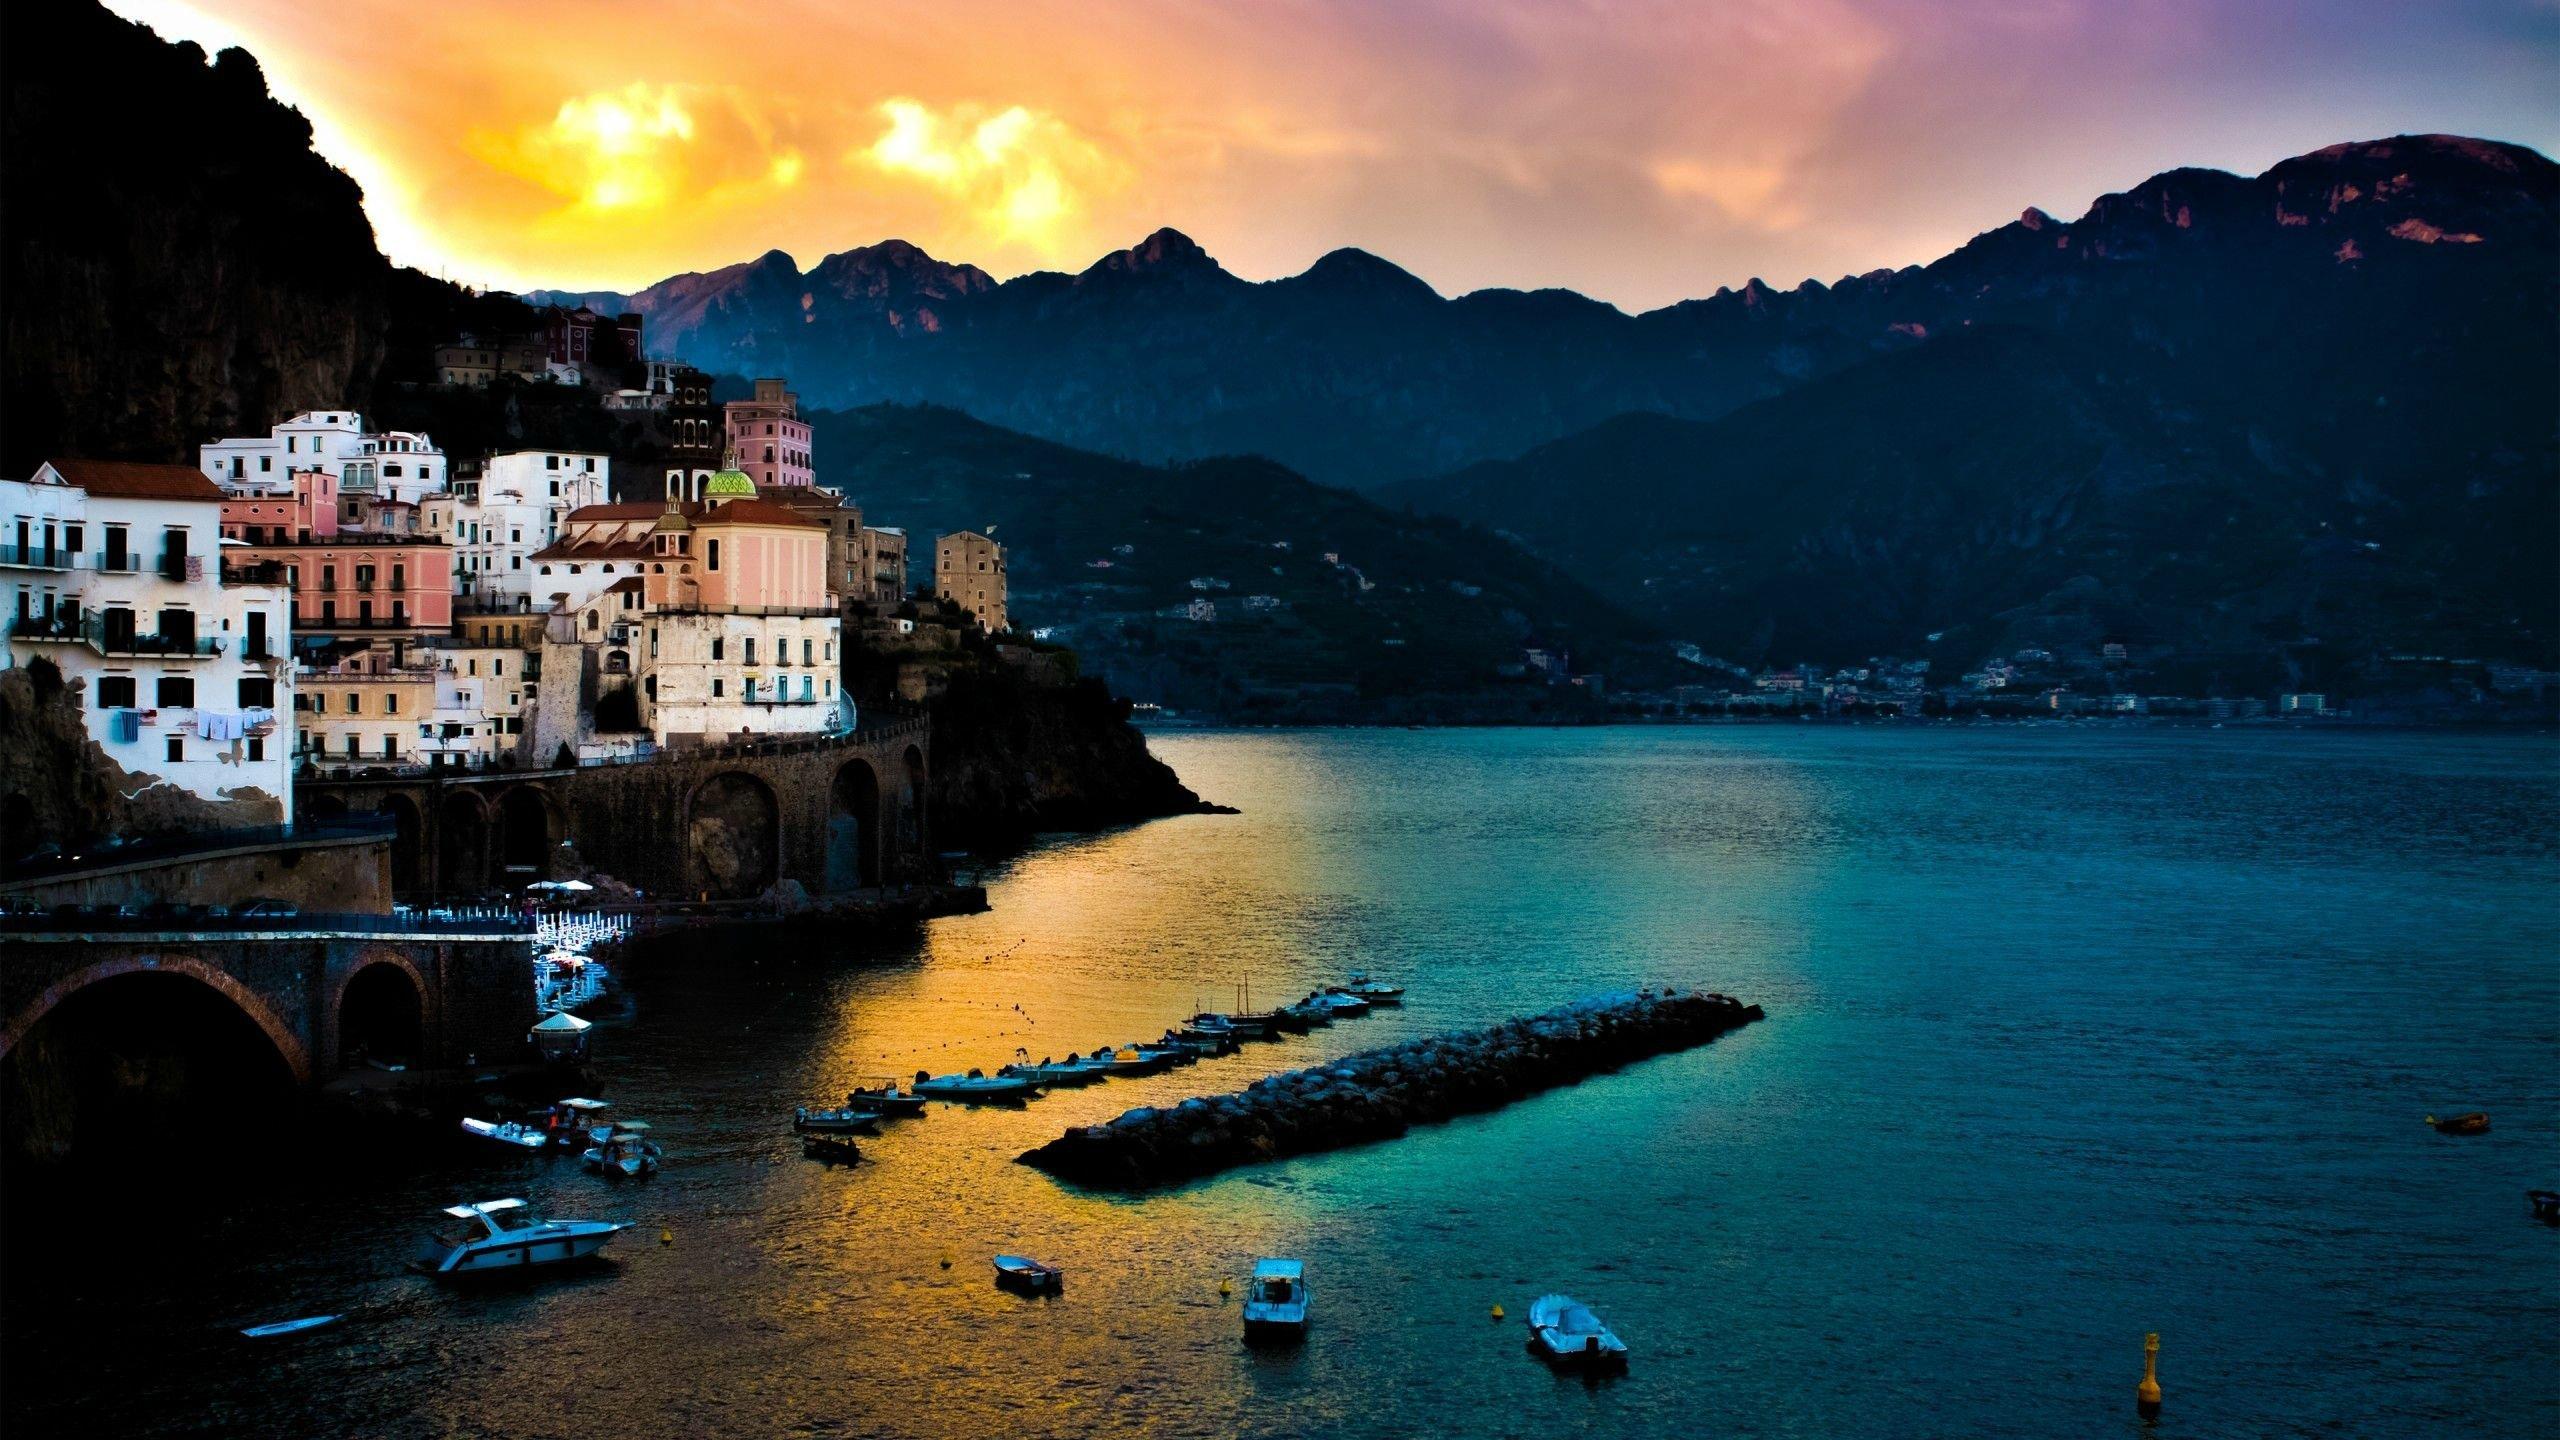 Amalfi coast landscape hd wallpaper - Italy screensaver ...